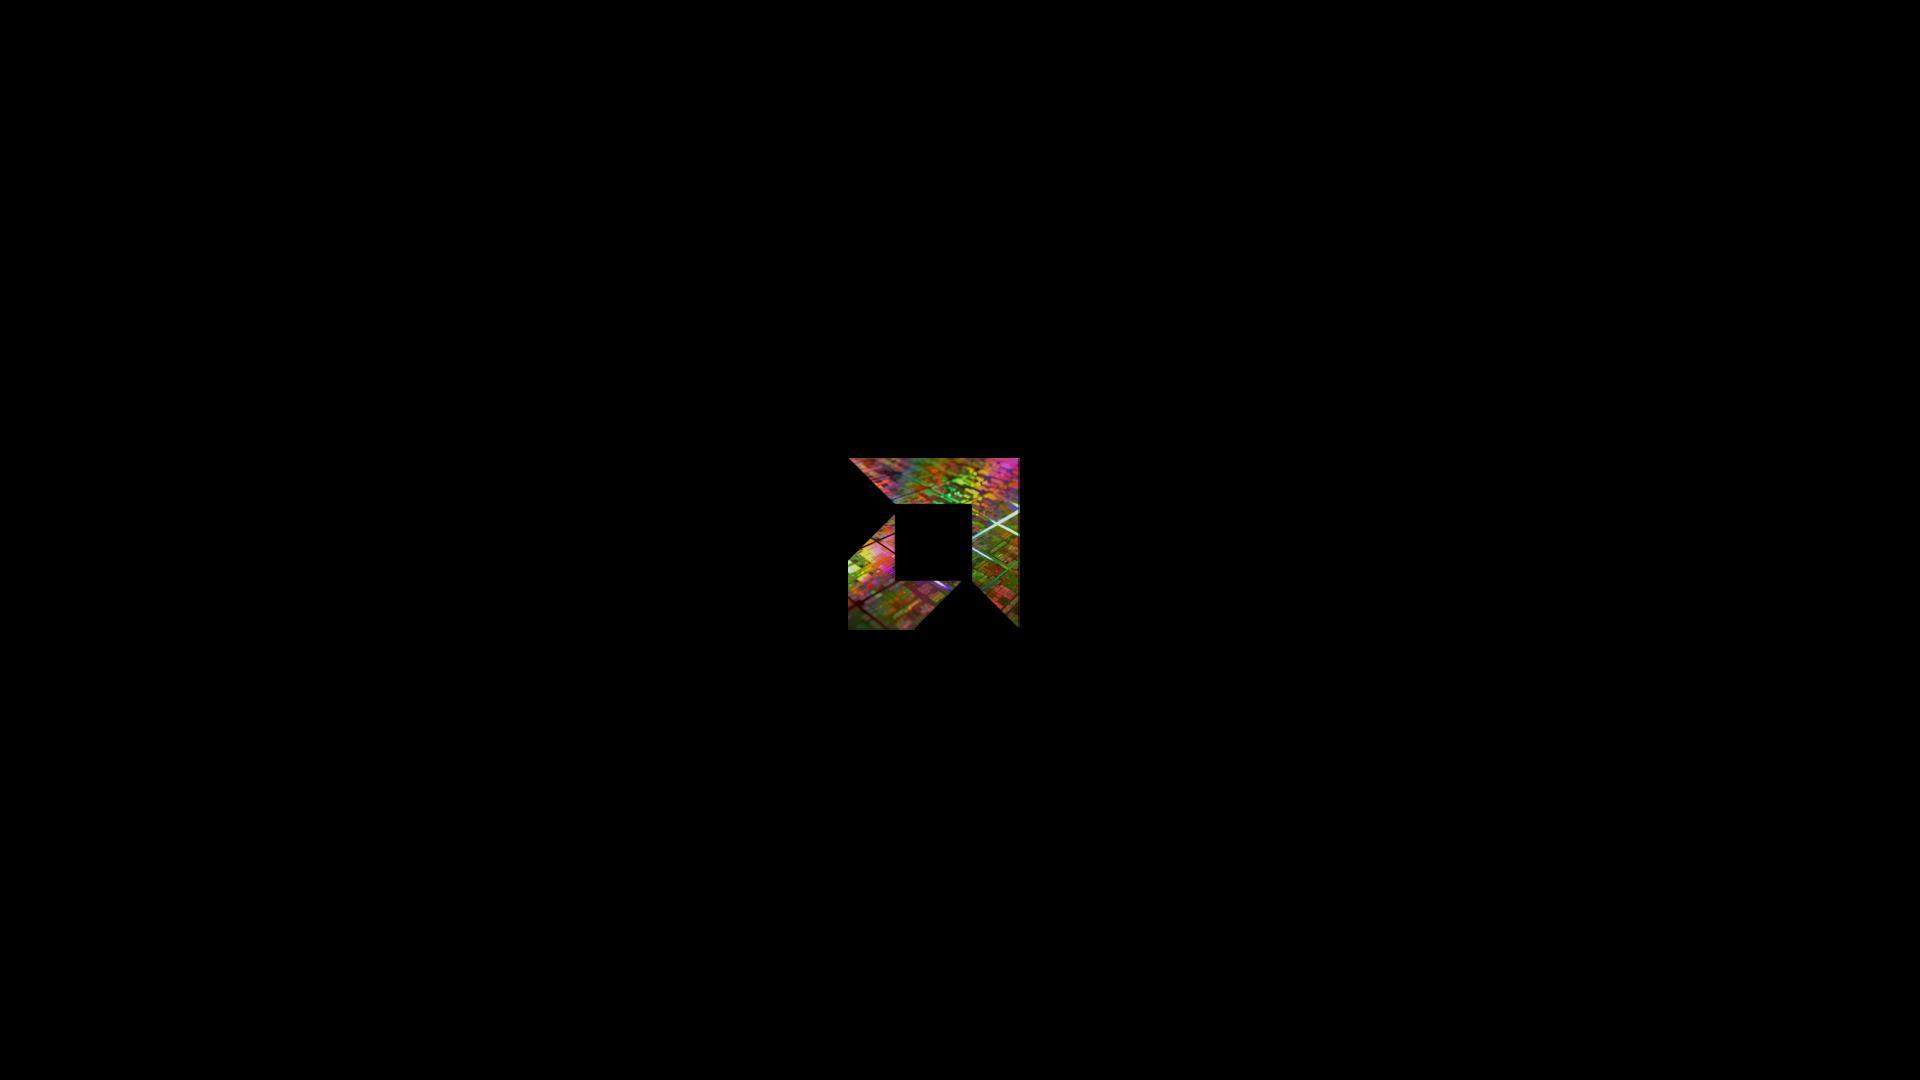 AMD Logo Wallpaper, 47+ Best & Inspirational High Quality AMD Logo